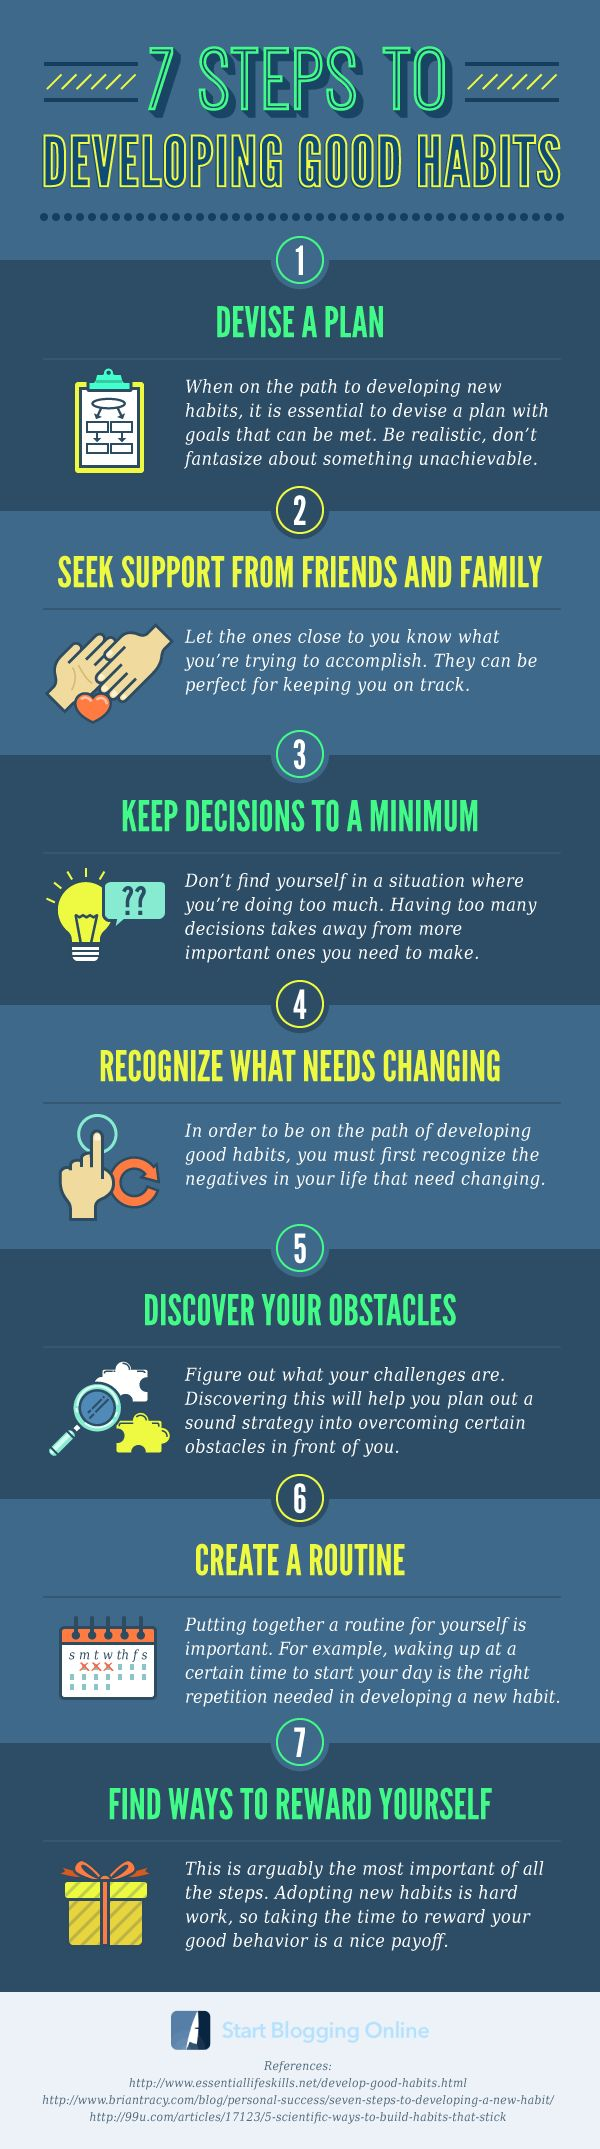 7 Steps to Developing Good Habits | Habit Change | Habit |Self Help | Self Improvement | Personal Development